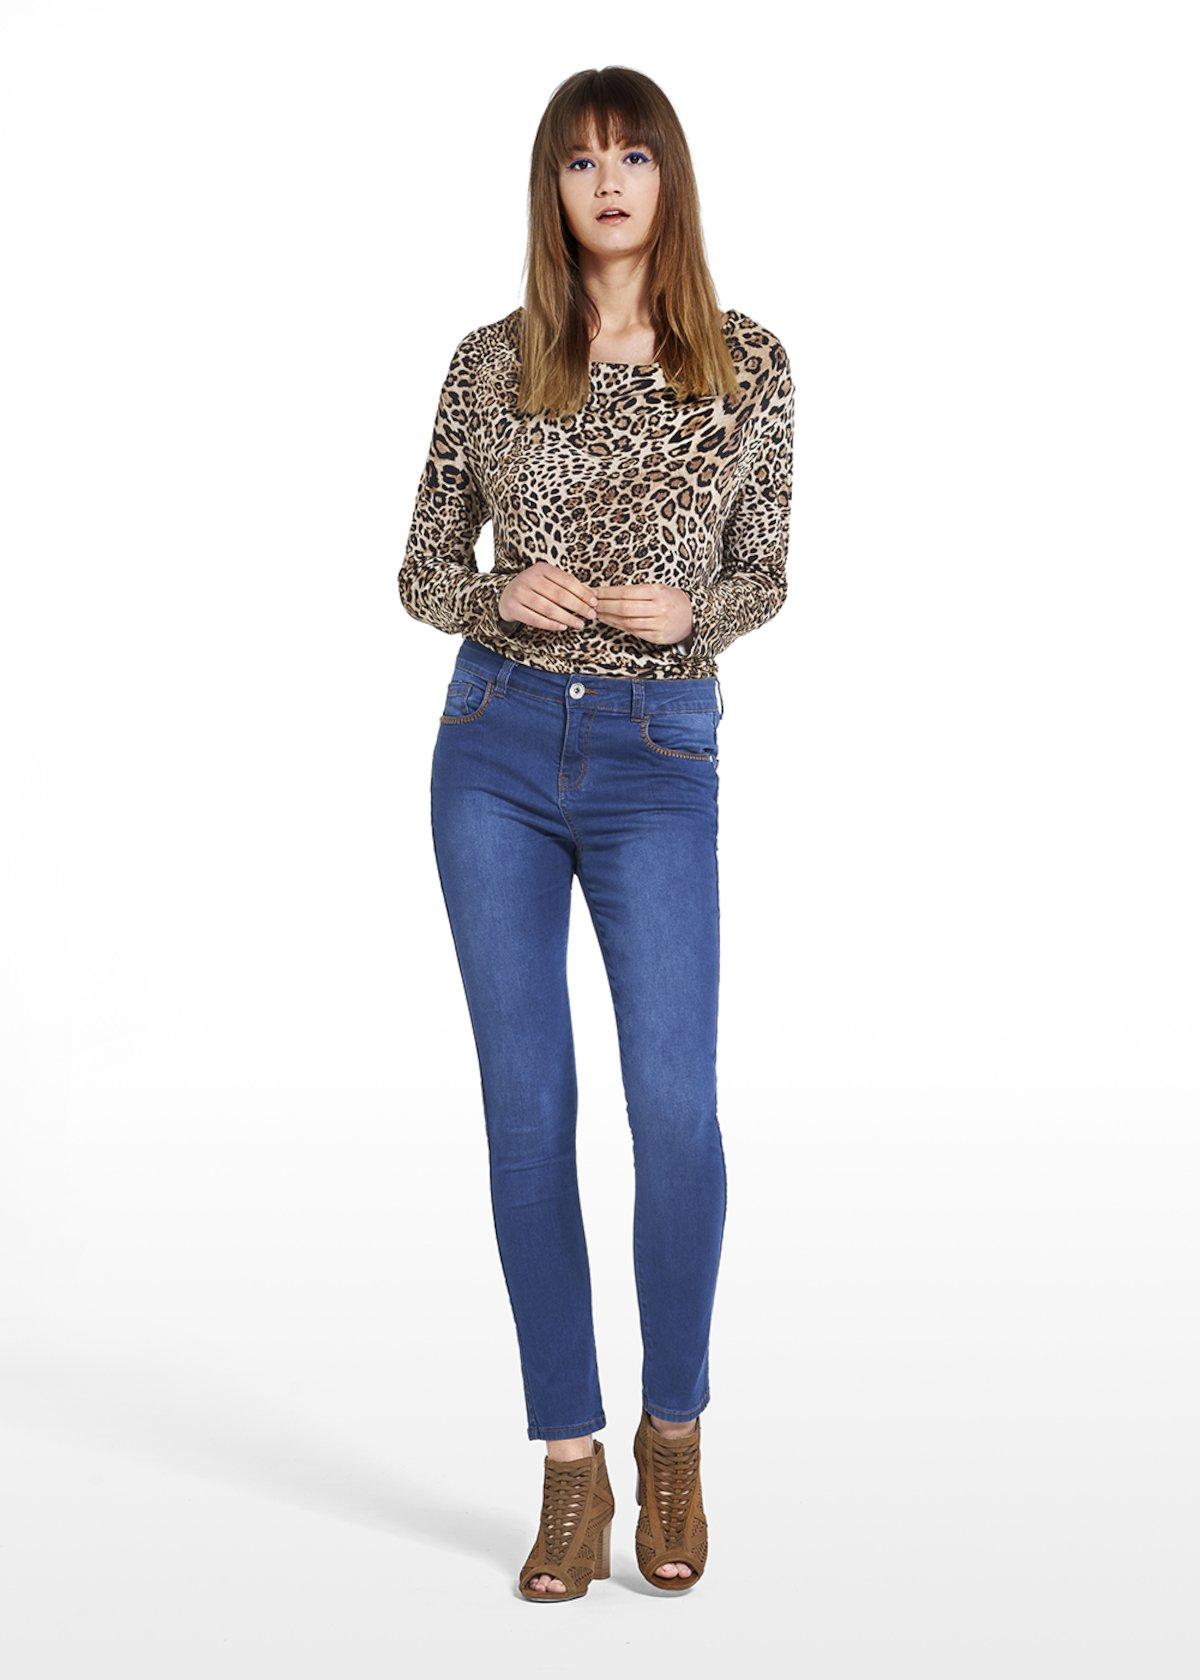 Jeans Denver with knitted stitch detail around the pockets - Medium Denim - Woman